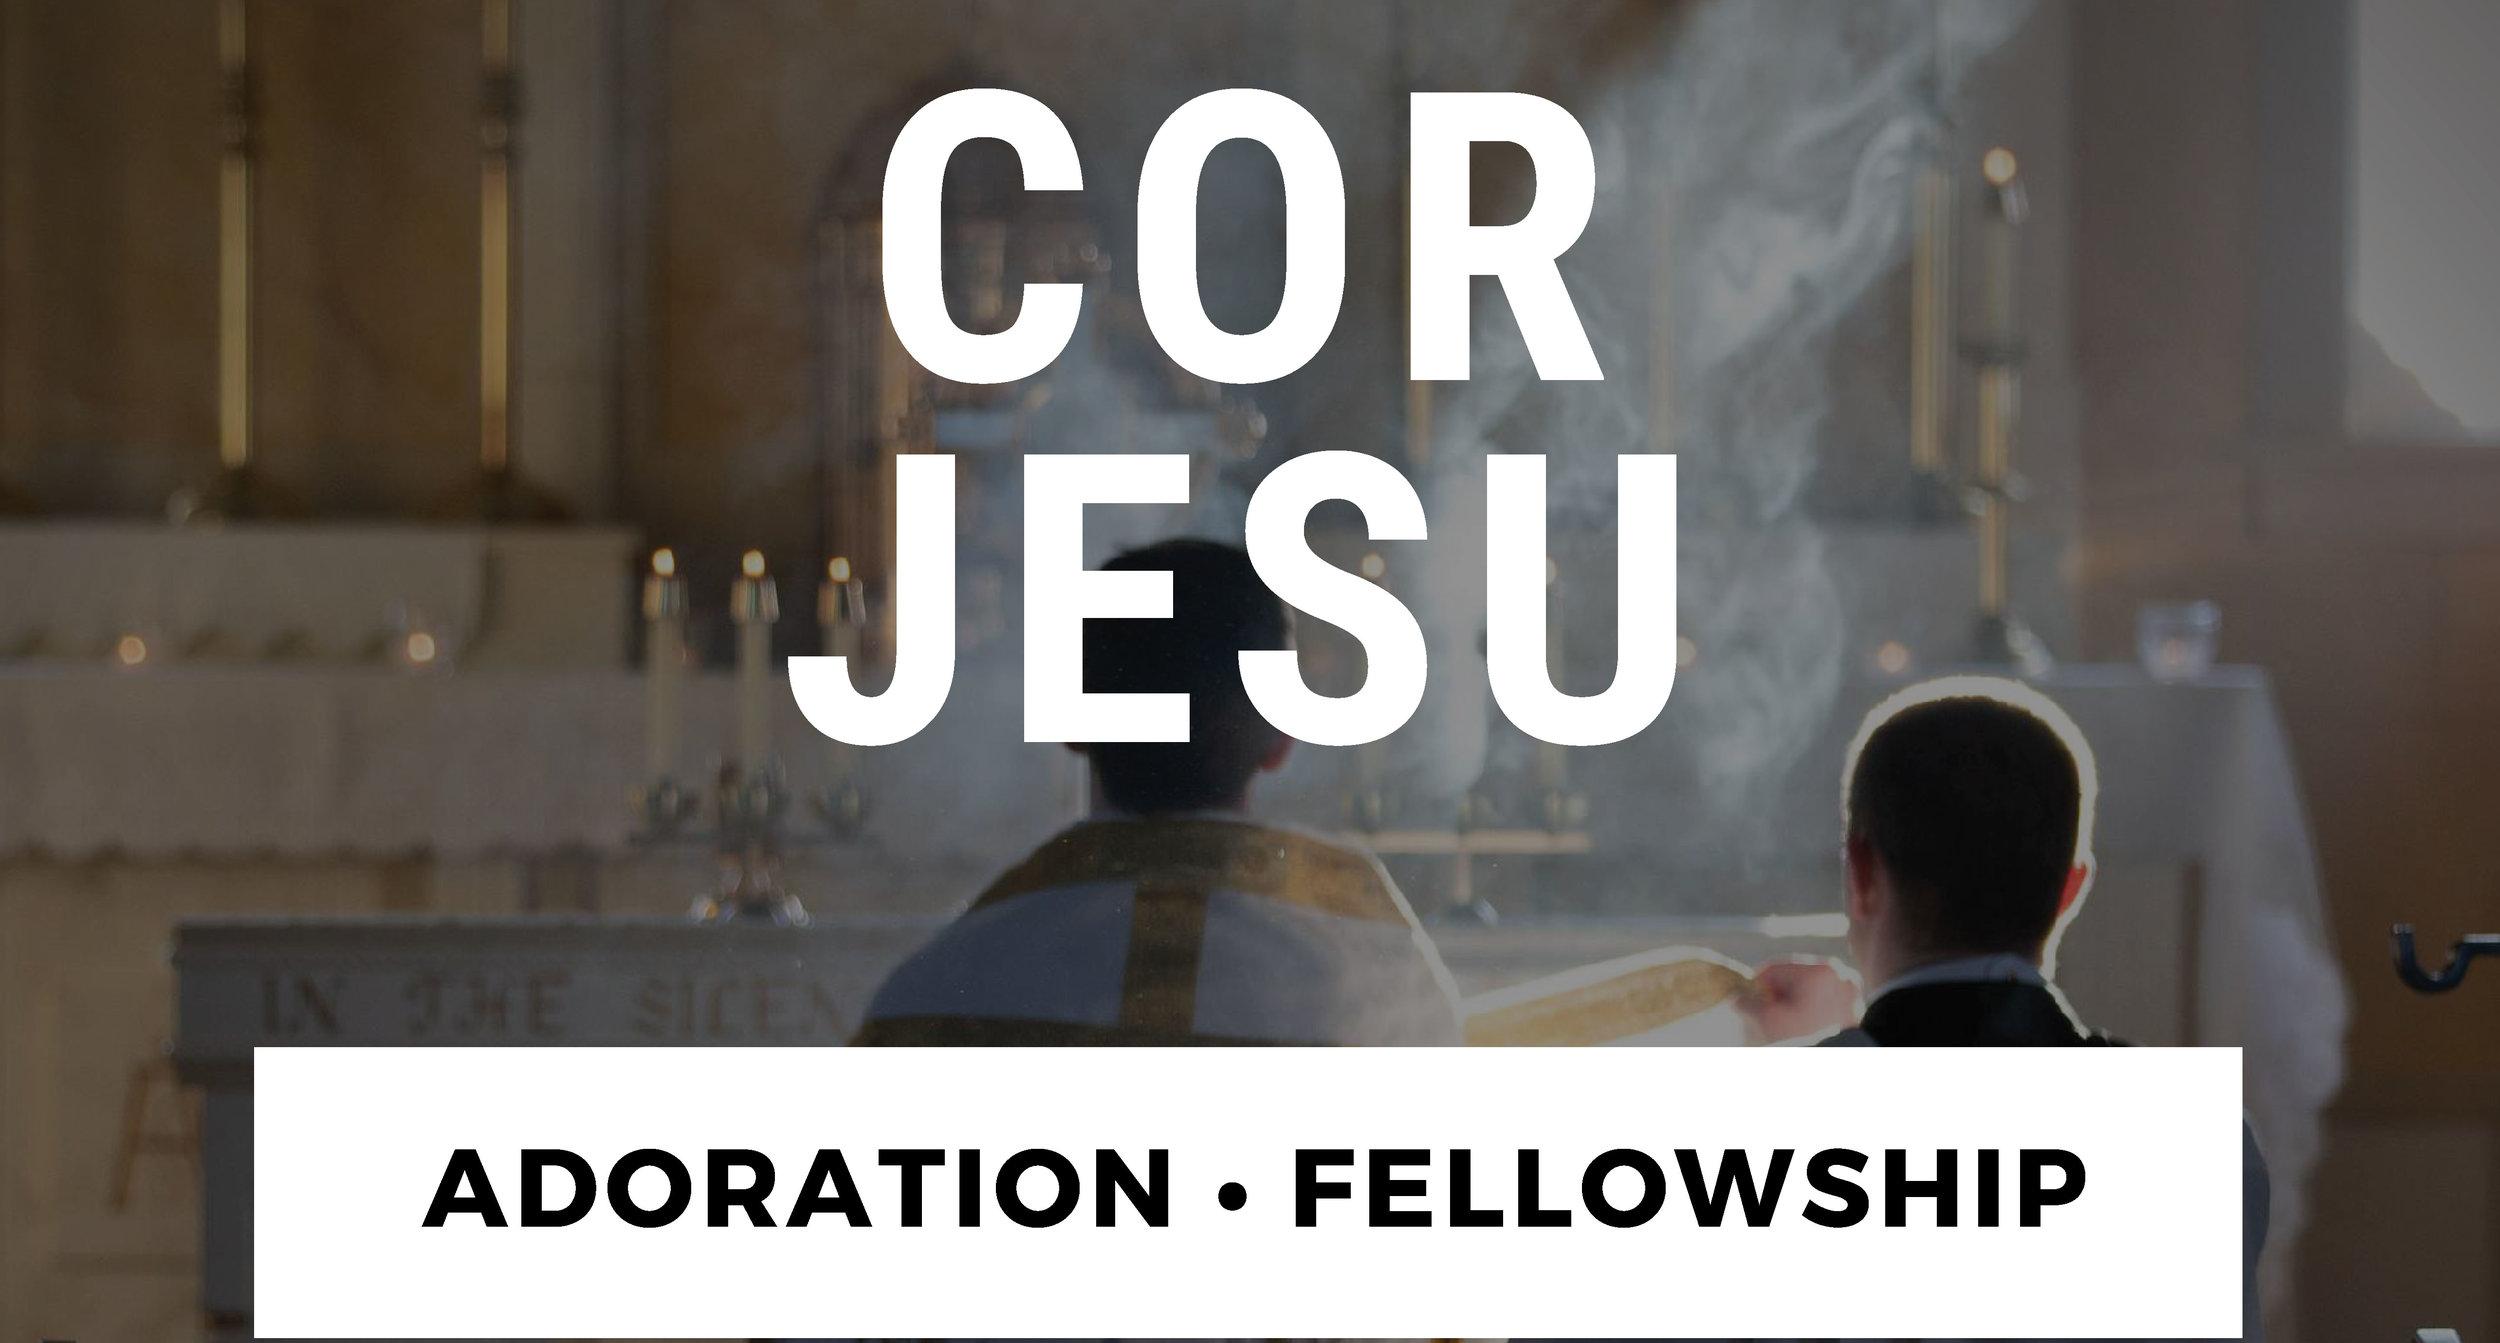 Cor Jesu Christmas Concert 2020 Cor Jesu — Diocese of New Ulm